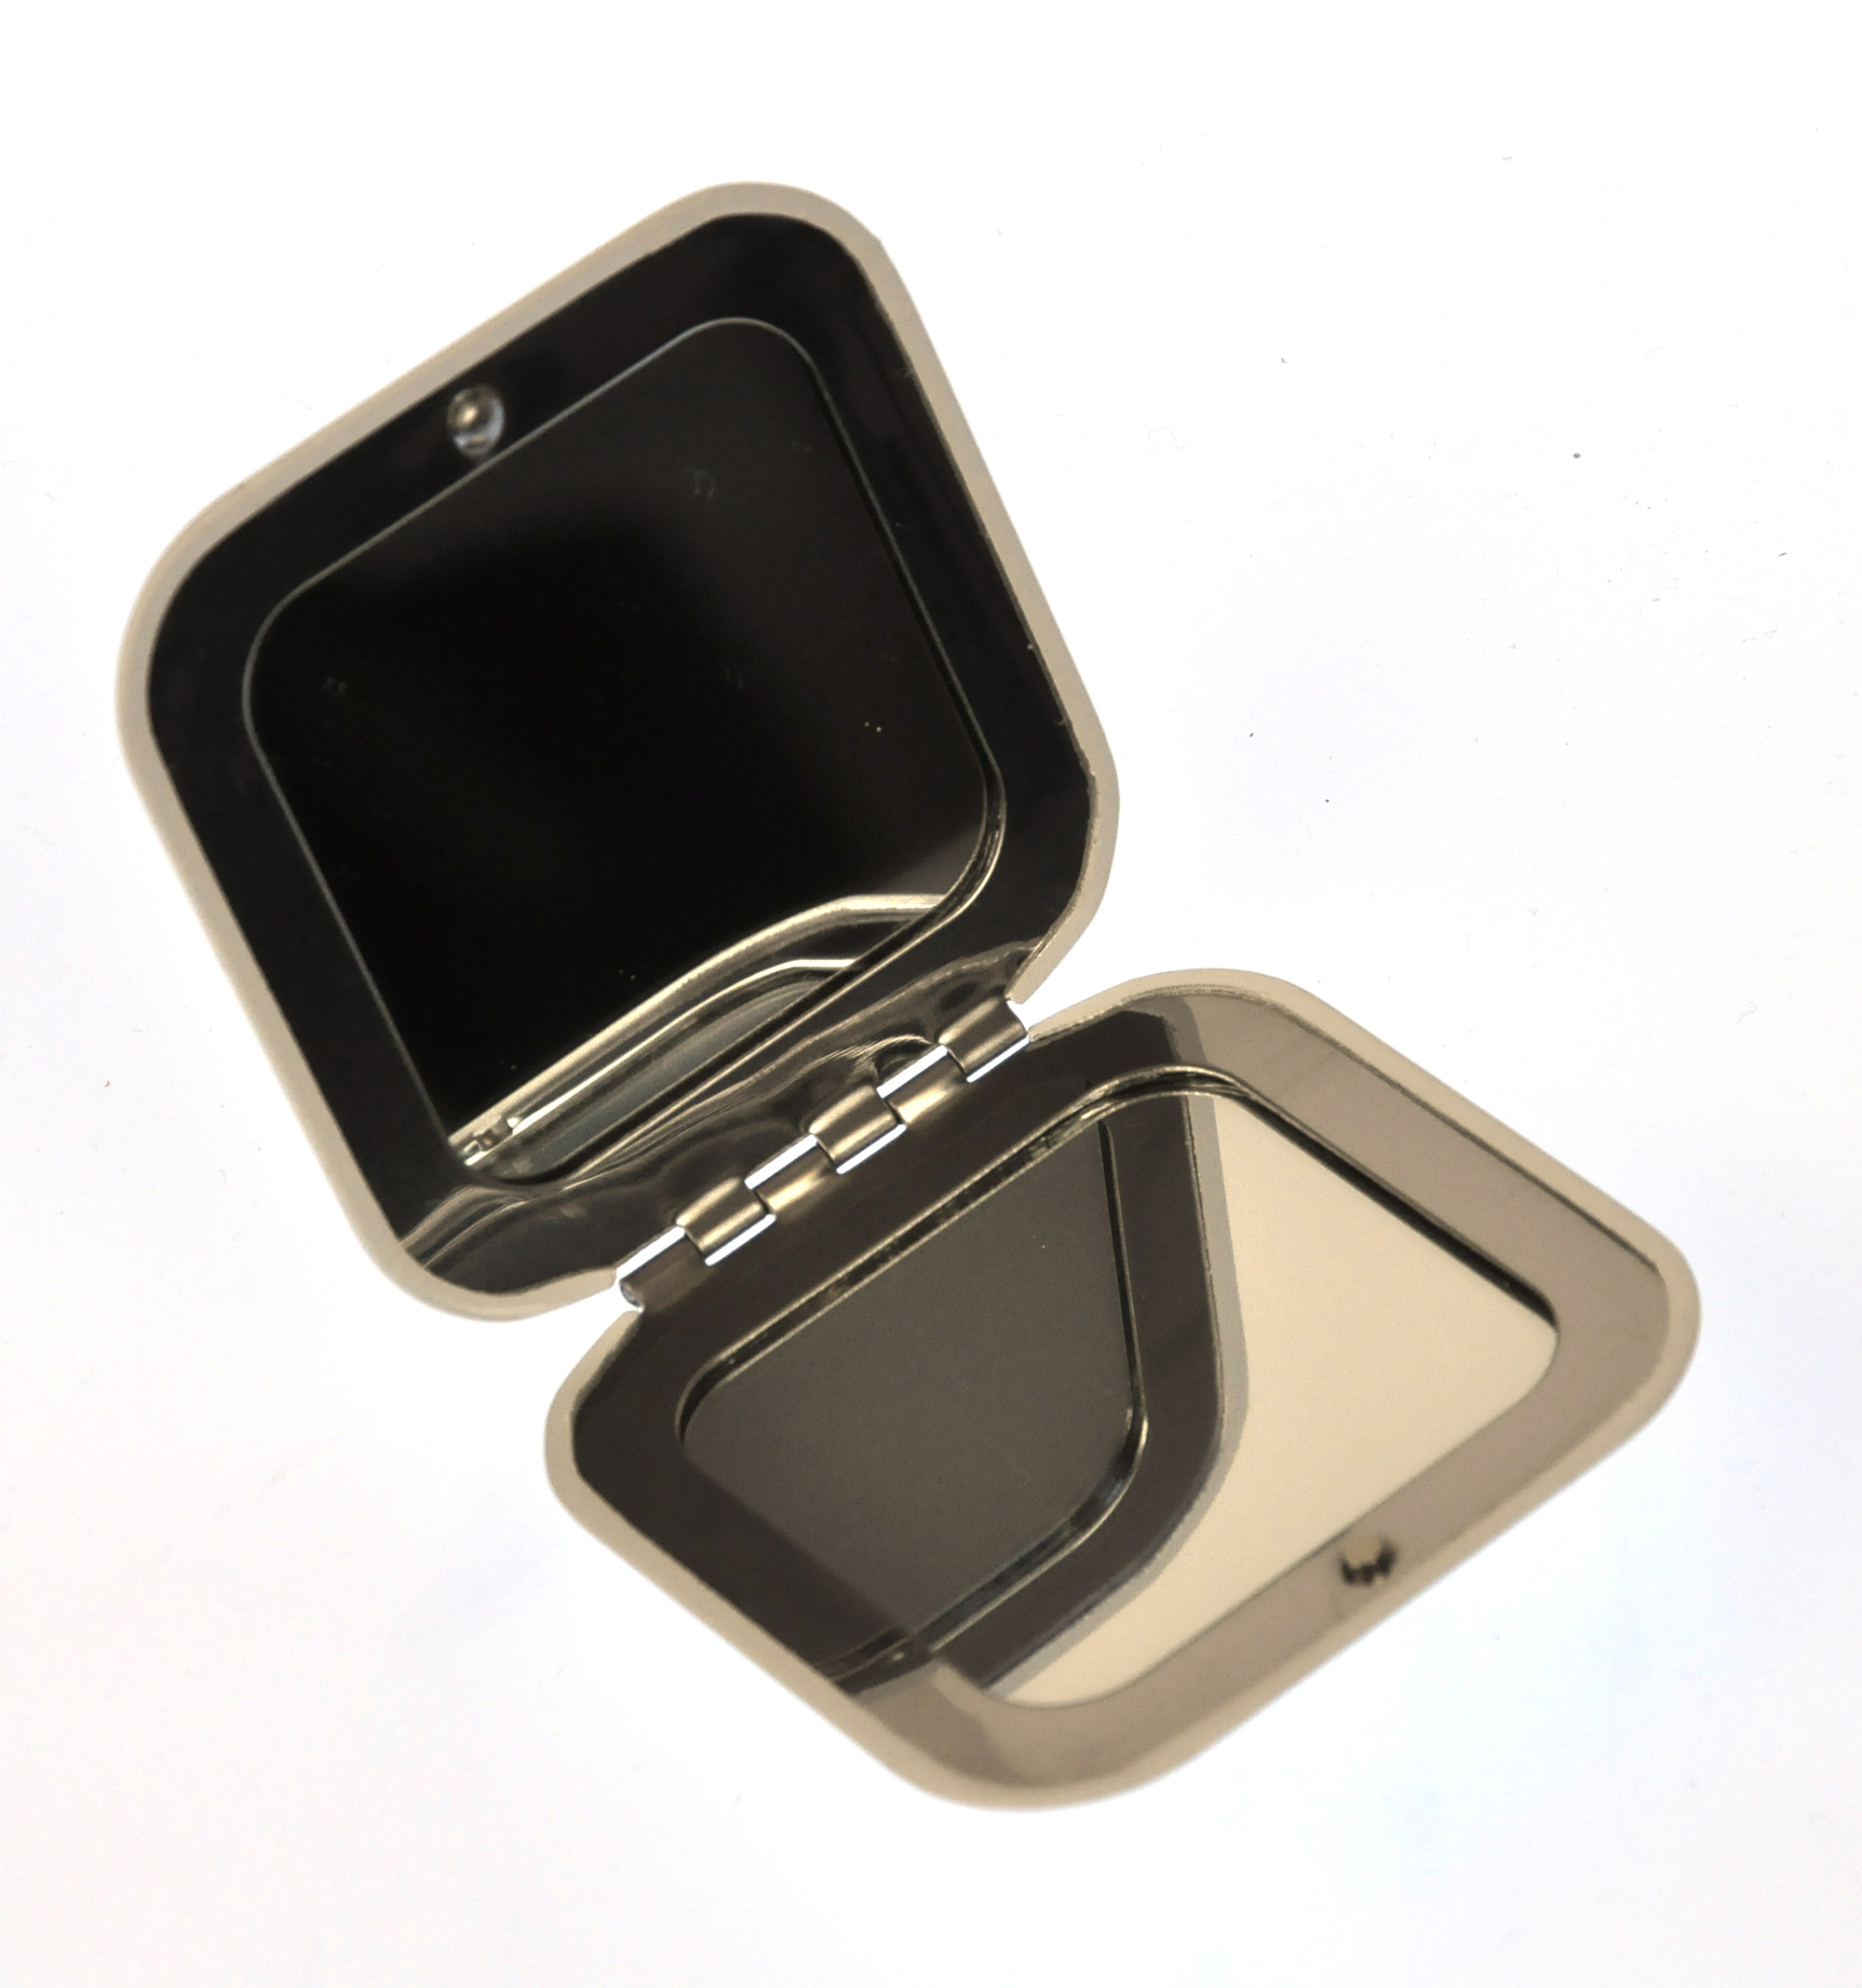 Sentinel Pug Square Compact Handbag Mirror